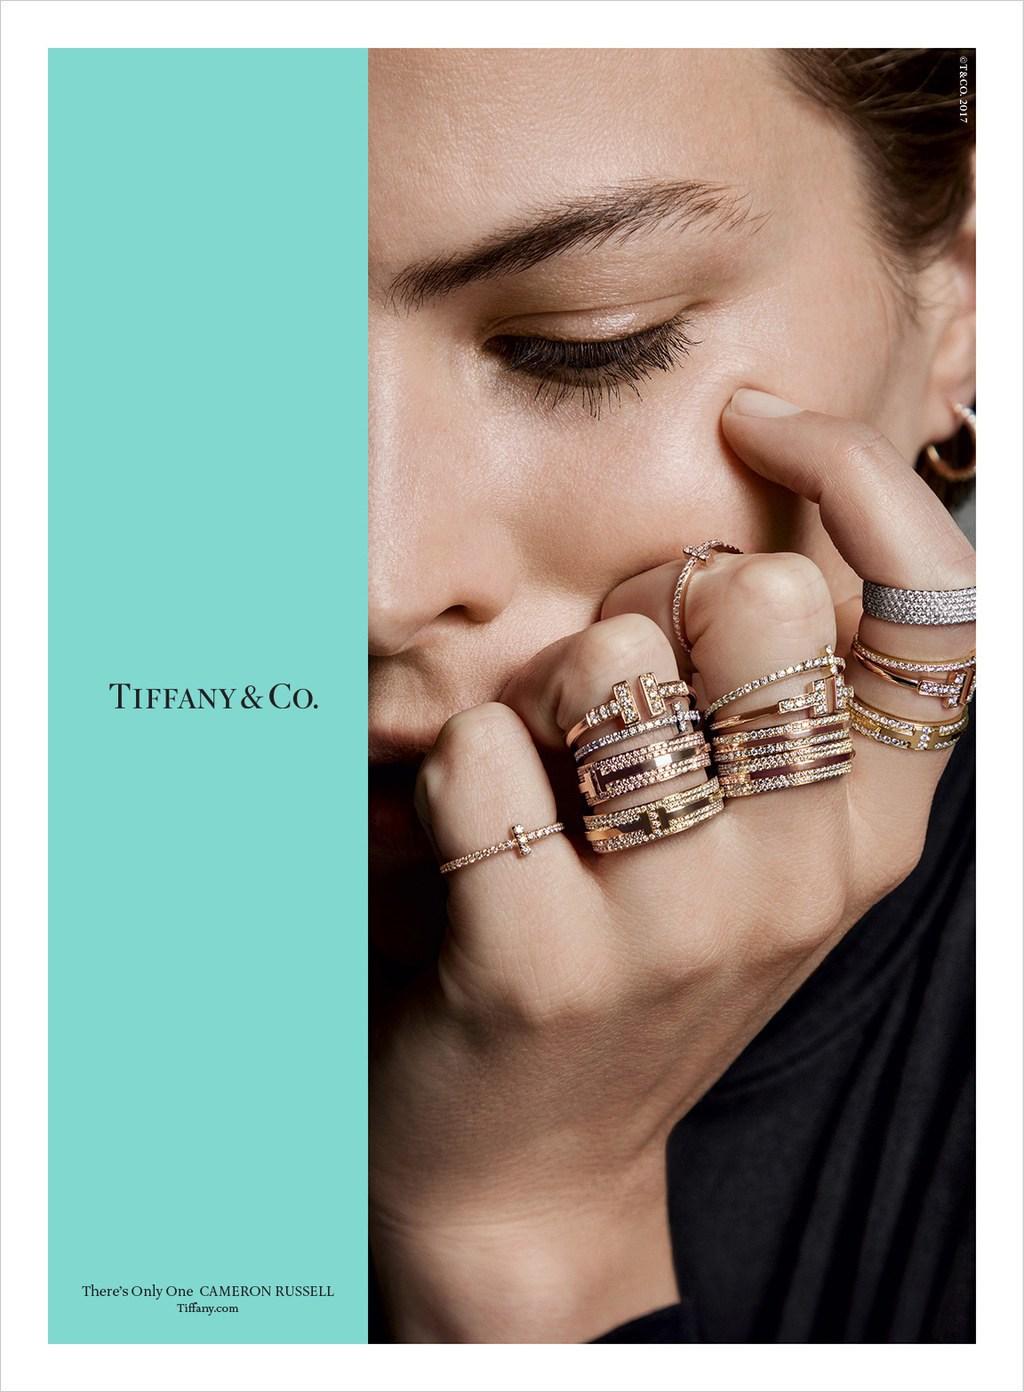 Tiffany-and-co-fall-2017-ad-campaign-the-impression-007